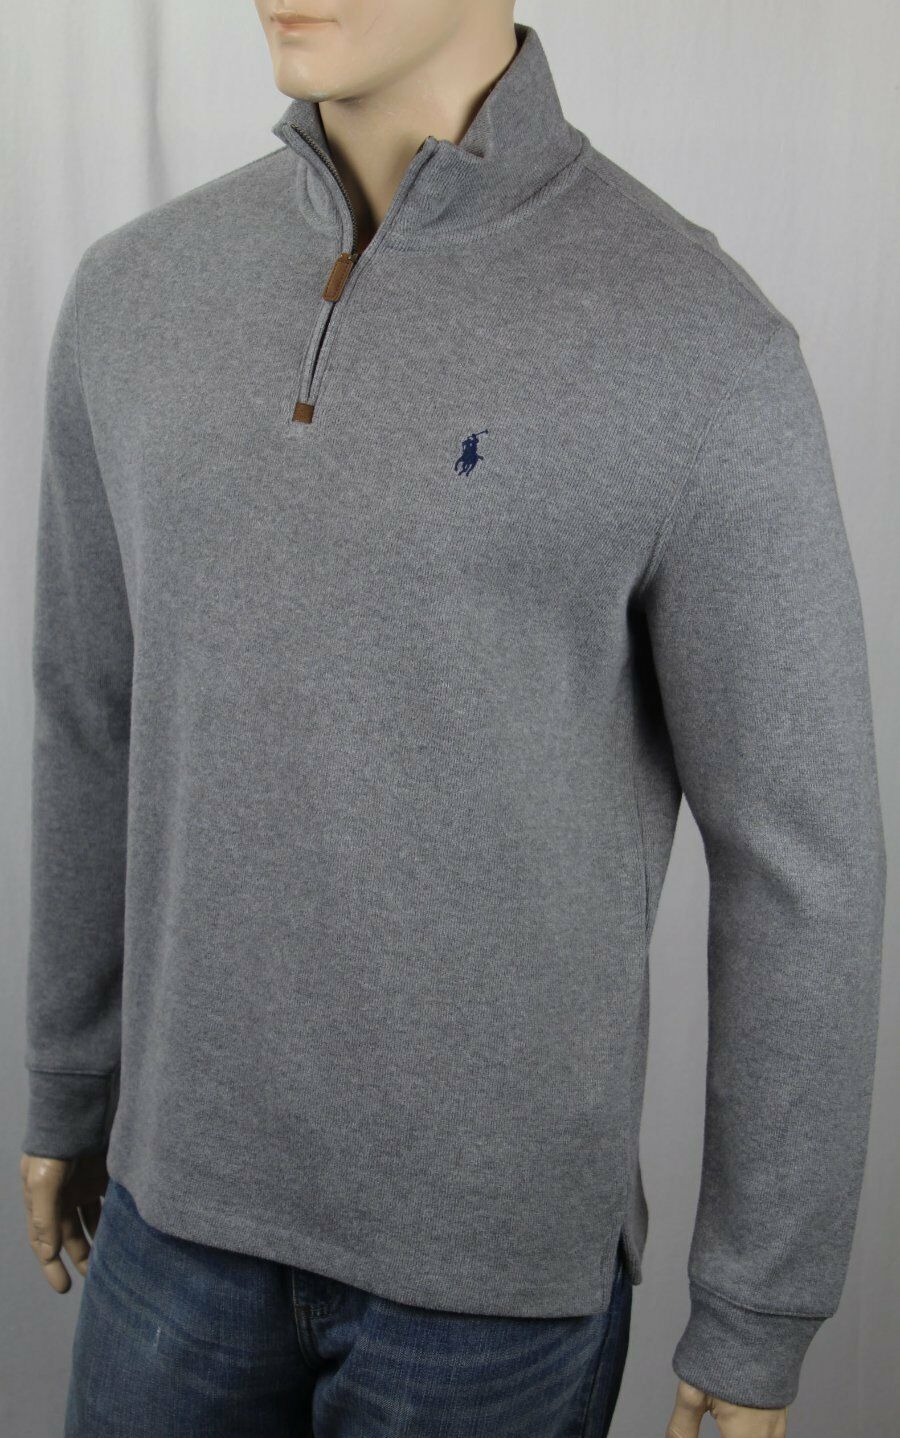 Polo Ralph Lauren Grau 1/2 Half Zip Sweater Navy Blau Pony NWT